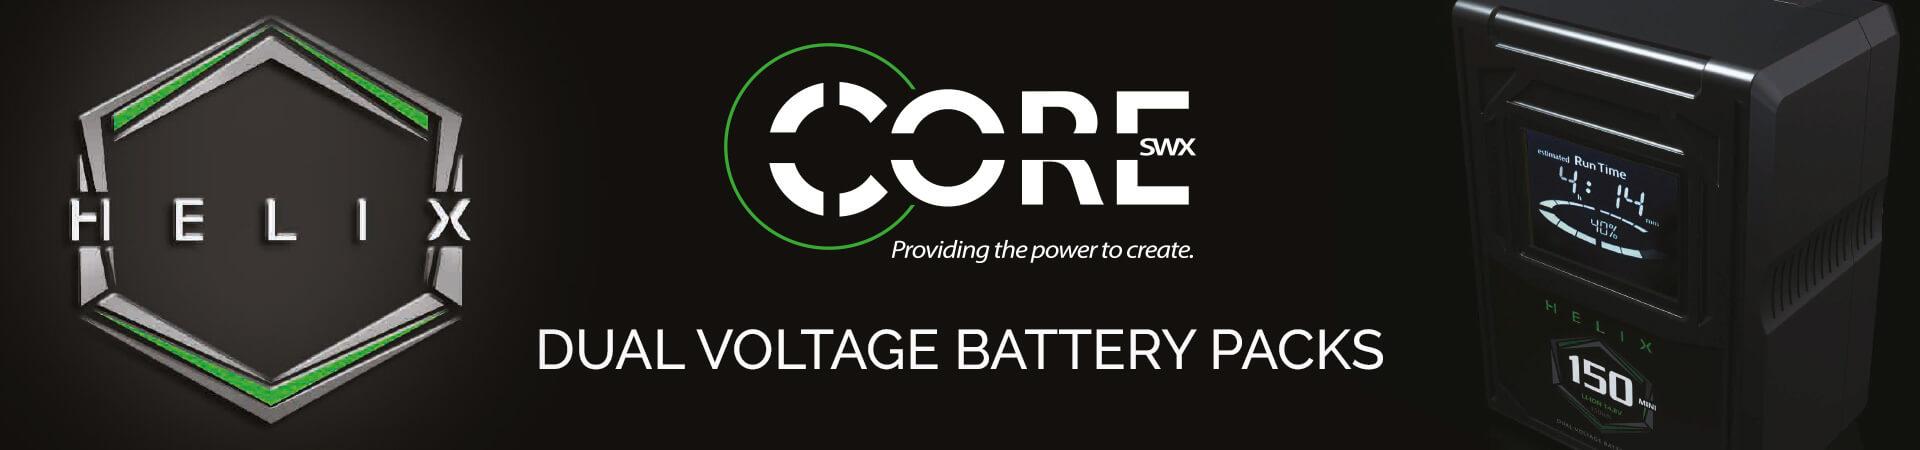 Core SWX Helix